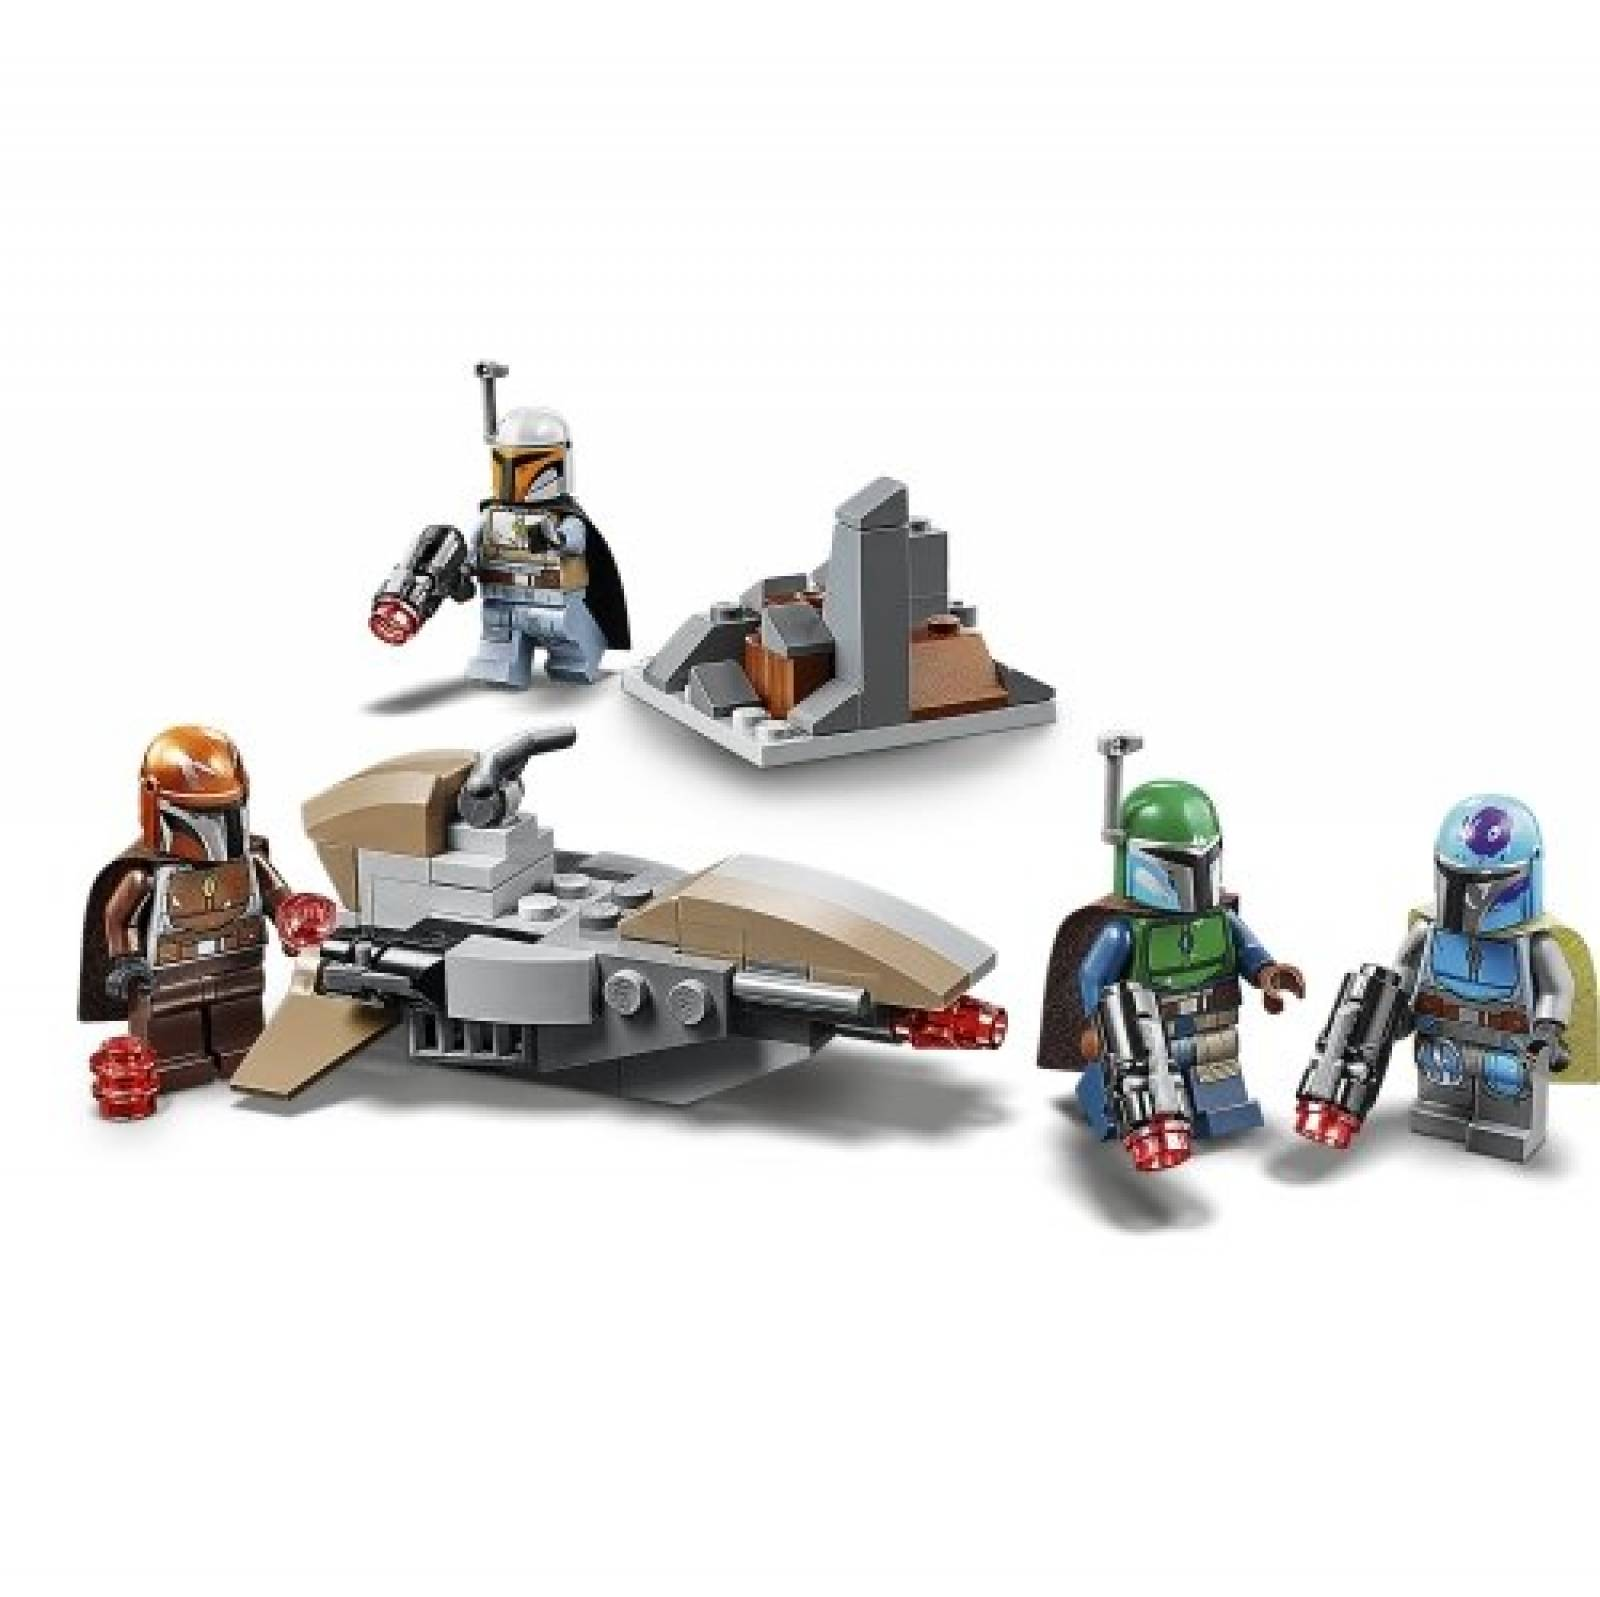 LEGO Star Wars Mandalorian Battle Pack 75267 thumbnails